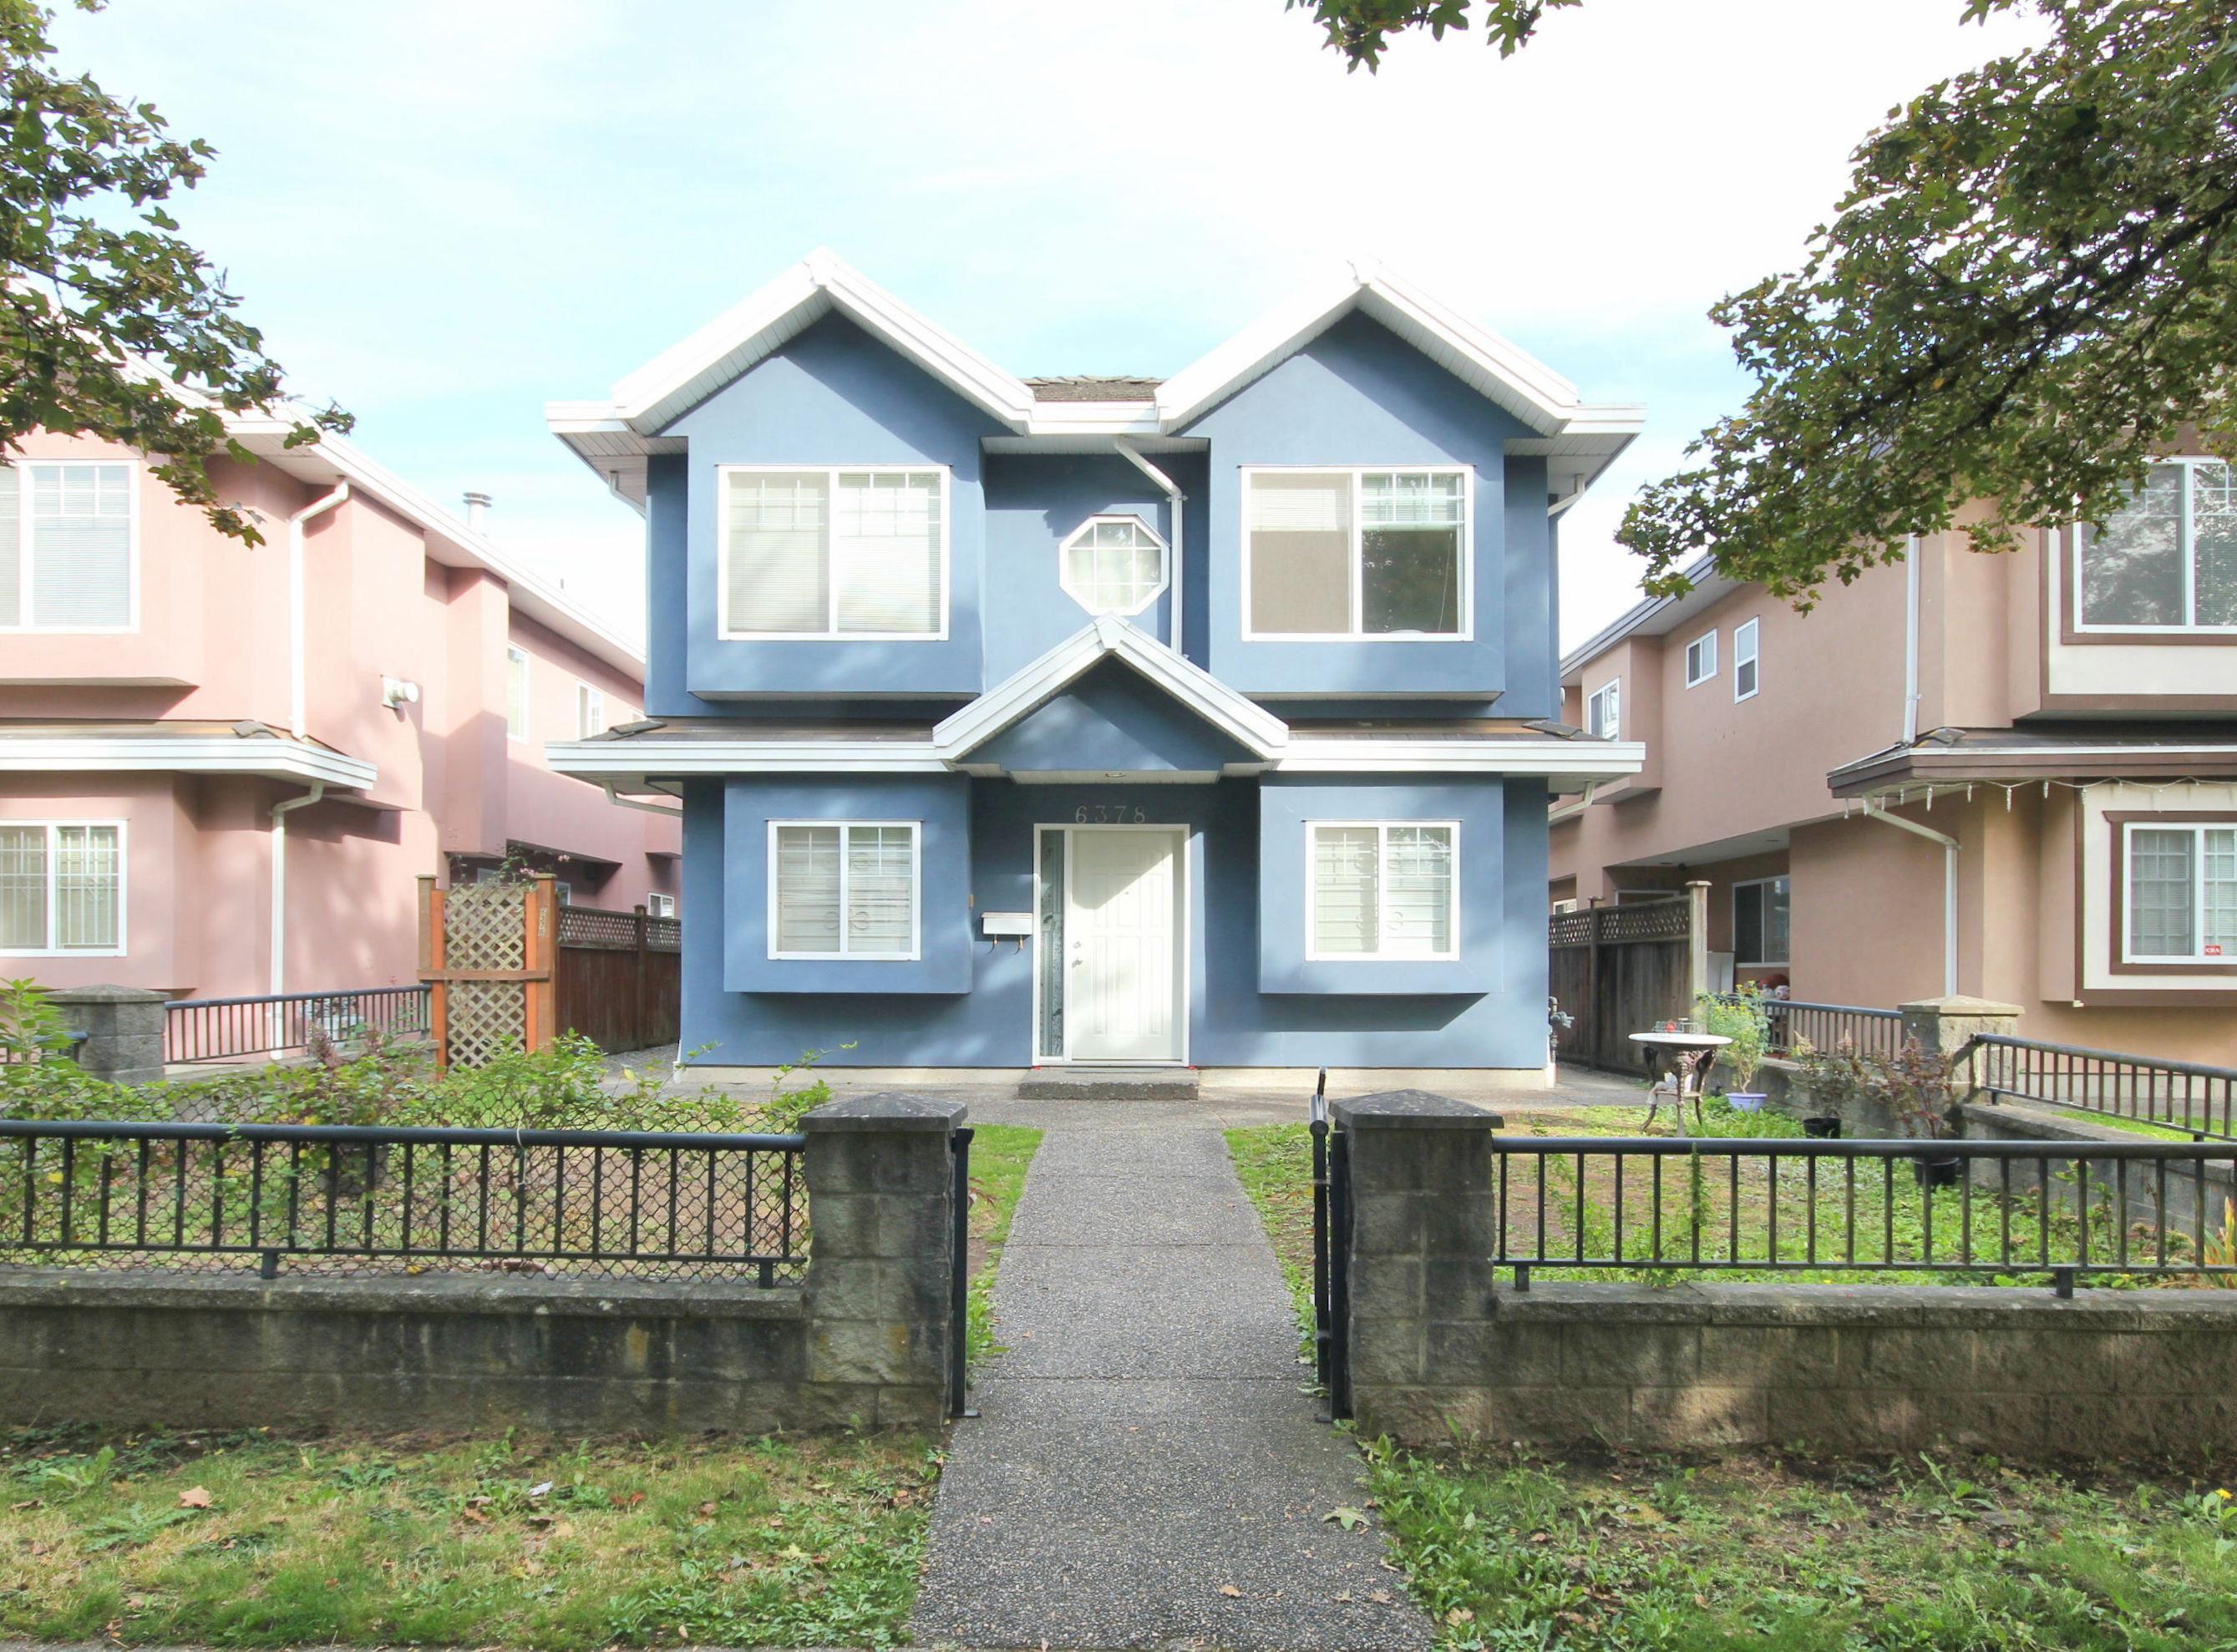 6376 BEATRICE STREET - Killarney VE 1/2 Duplex for sale, 4 Bedrooms (R2622711) - #1